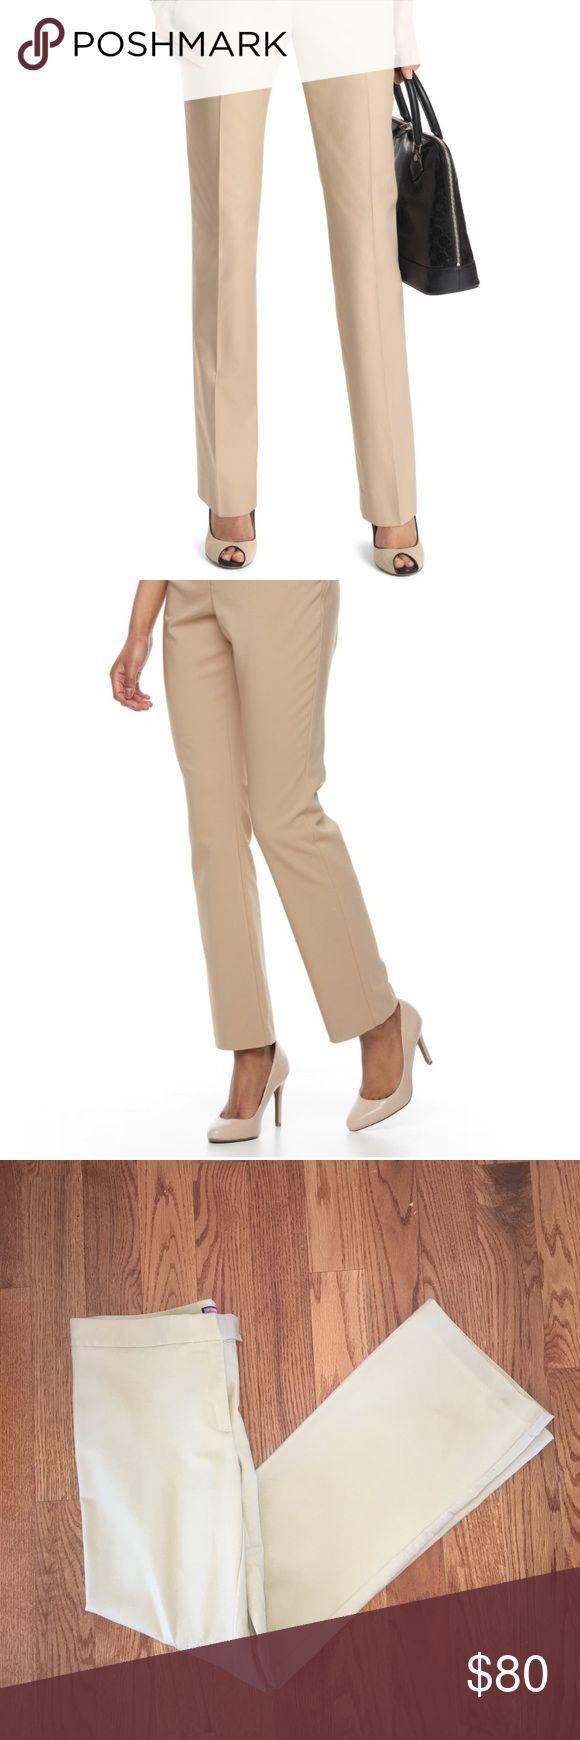 Vineyard Vines NWT Tan Chino Khaki Pants Size 12 Brand new with tags. Vineyard Vines Pants Trousers